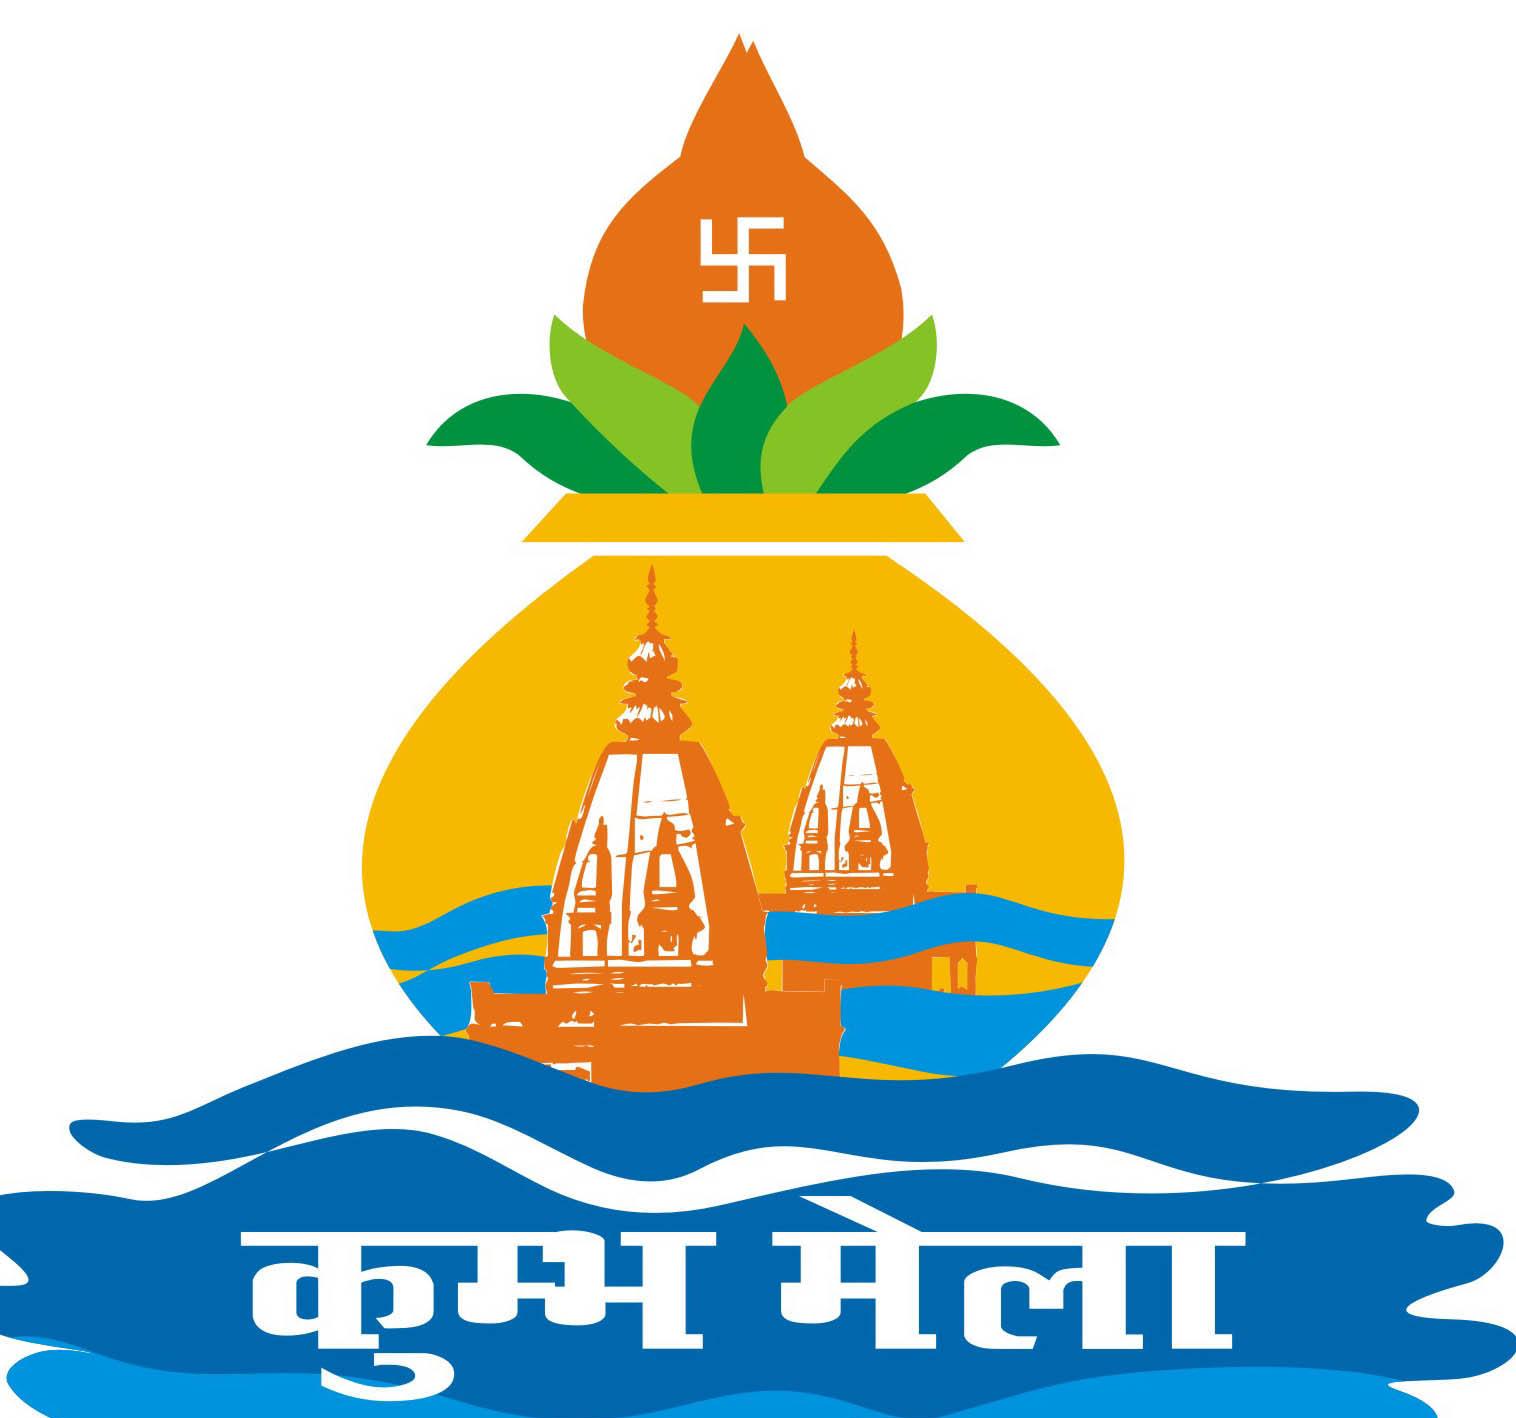 UP theatres to show Kumbh Mela logo before screening films